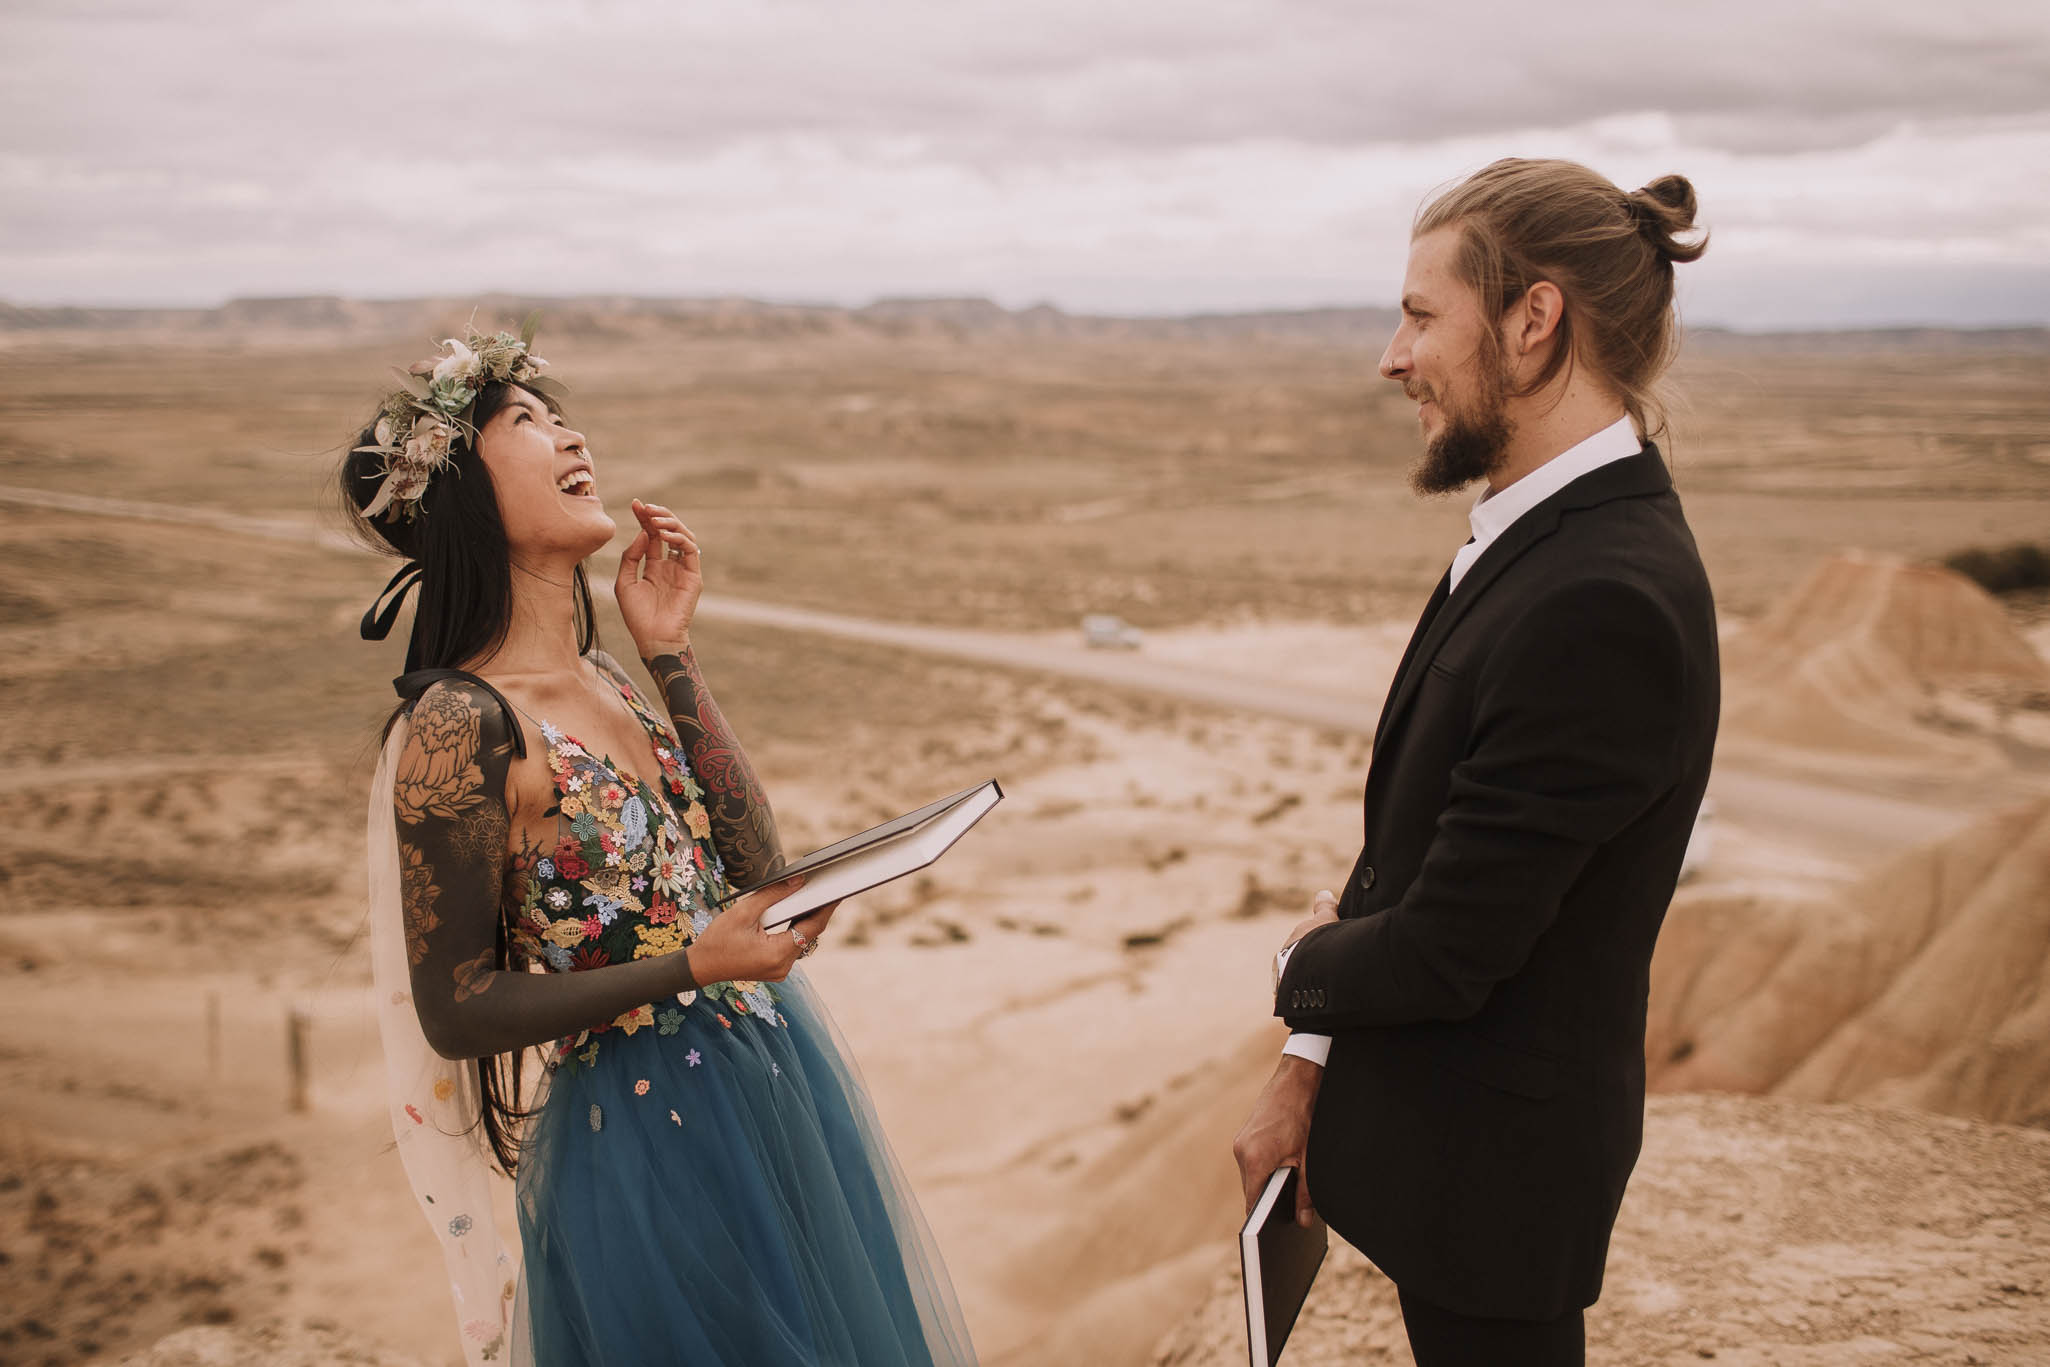 Spain-wedding-photographer-bardenas-reales-jeremy-boyer-photographe-mariage-bordeaux-floral-wedding-dress-robe-96.jpg